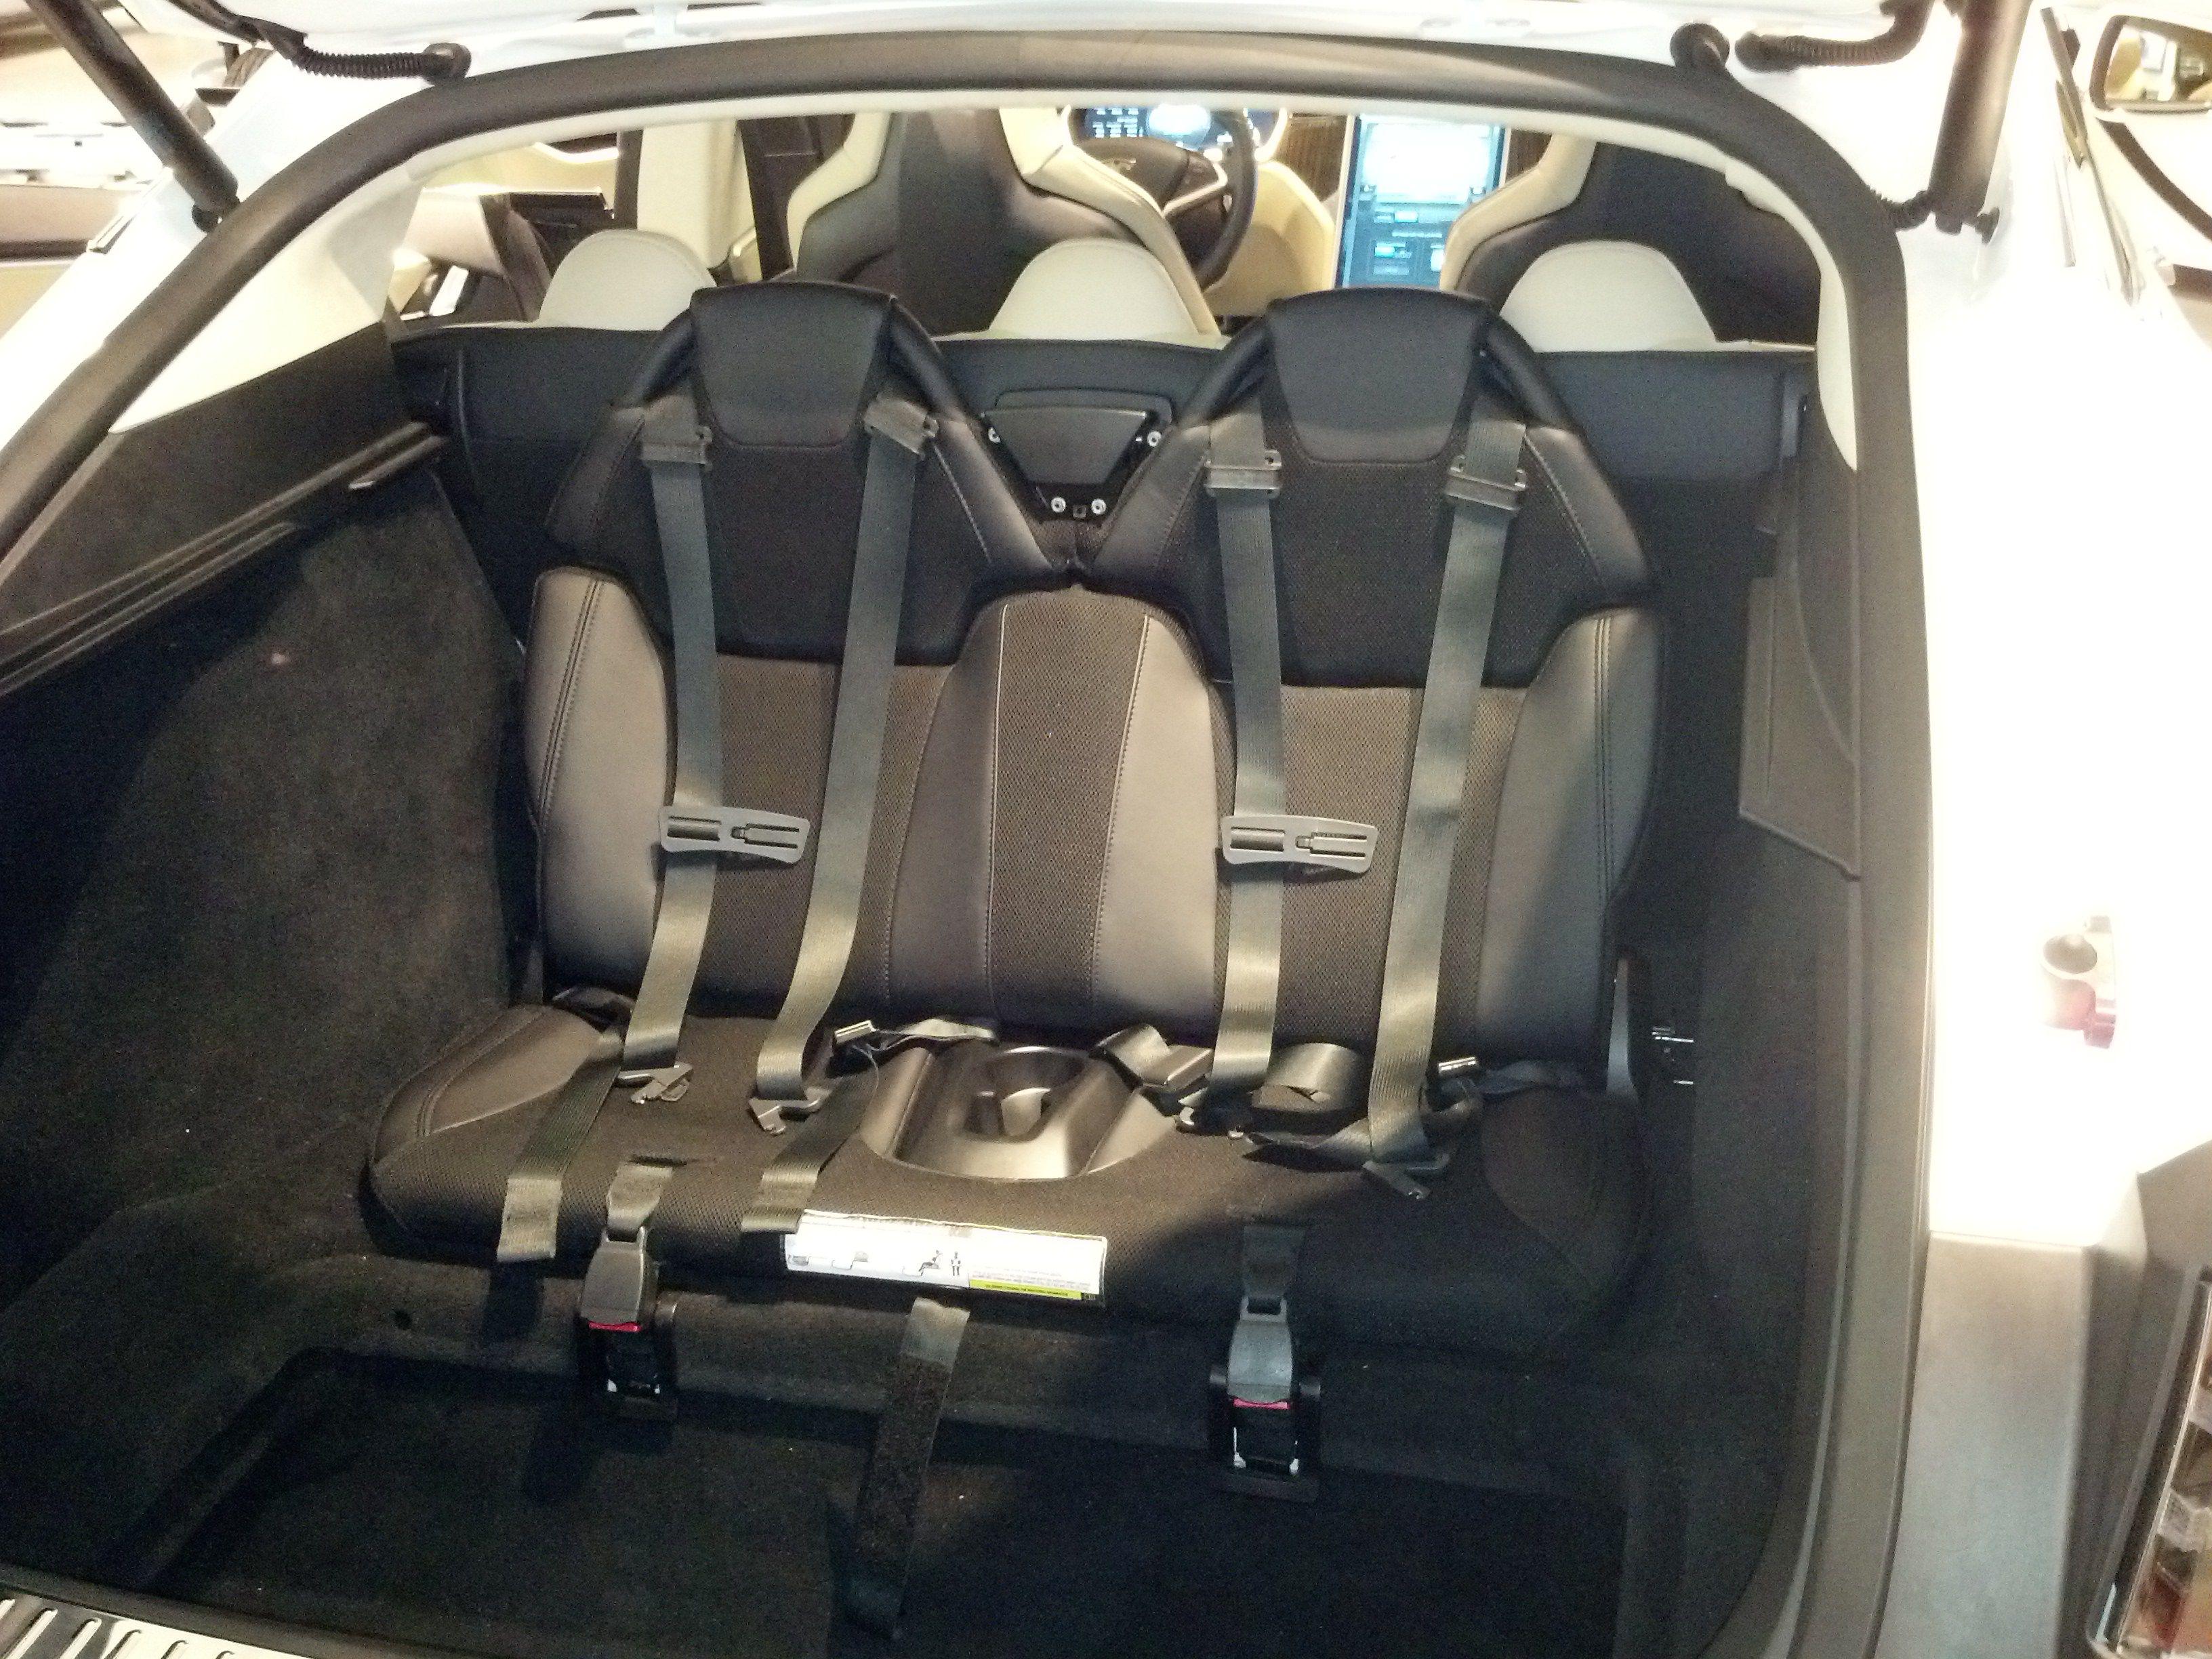 Tesla Model S 3rd Row Seating | Baby car seats, Hot cars, Cars